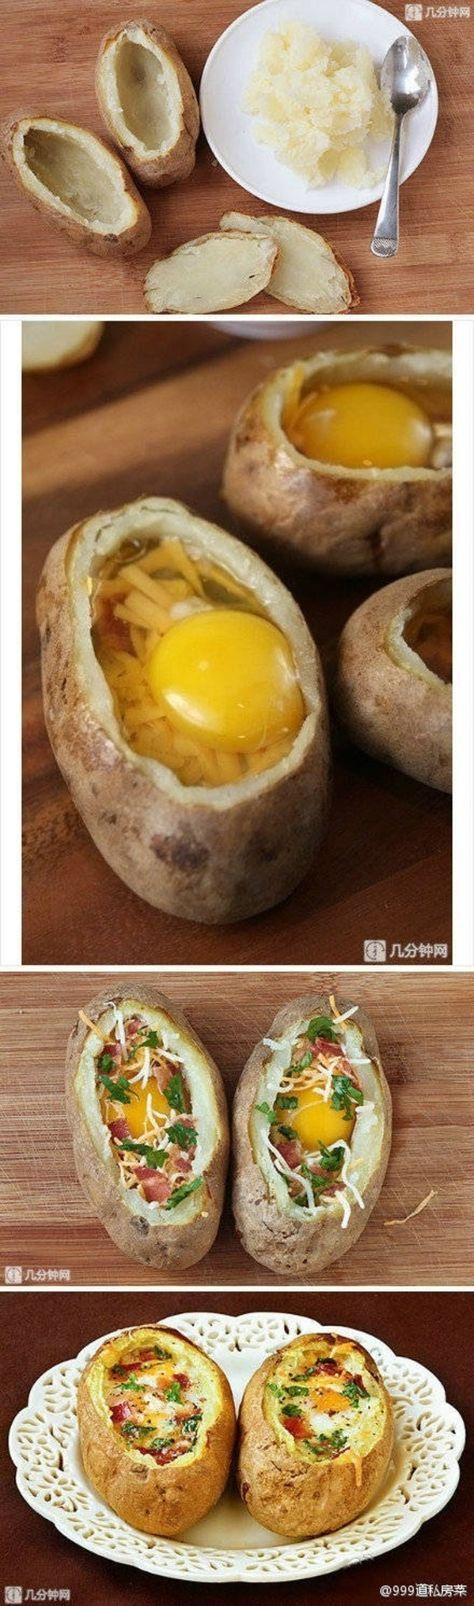 1 baked potato 1 Tbsp butter 2 eggs 2 strips bacon…